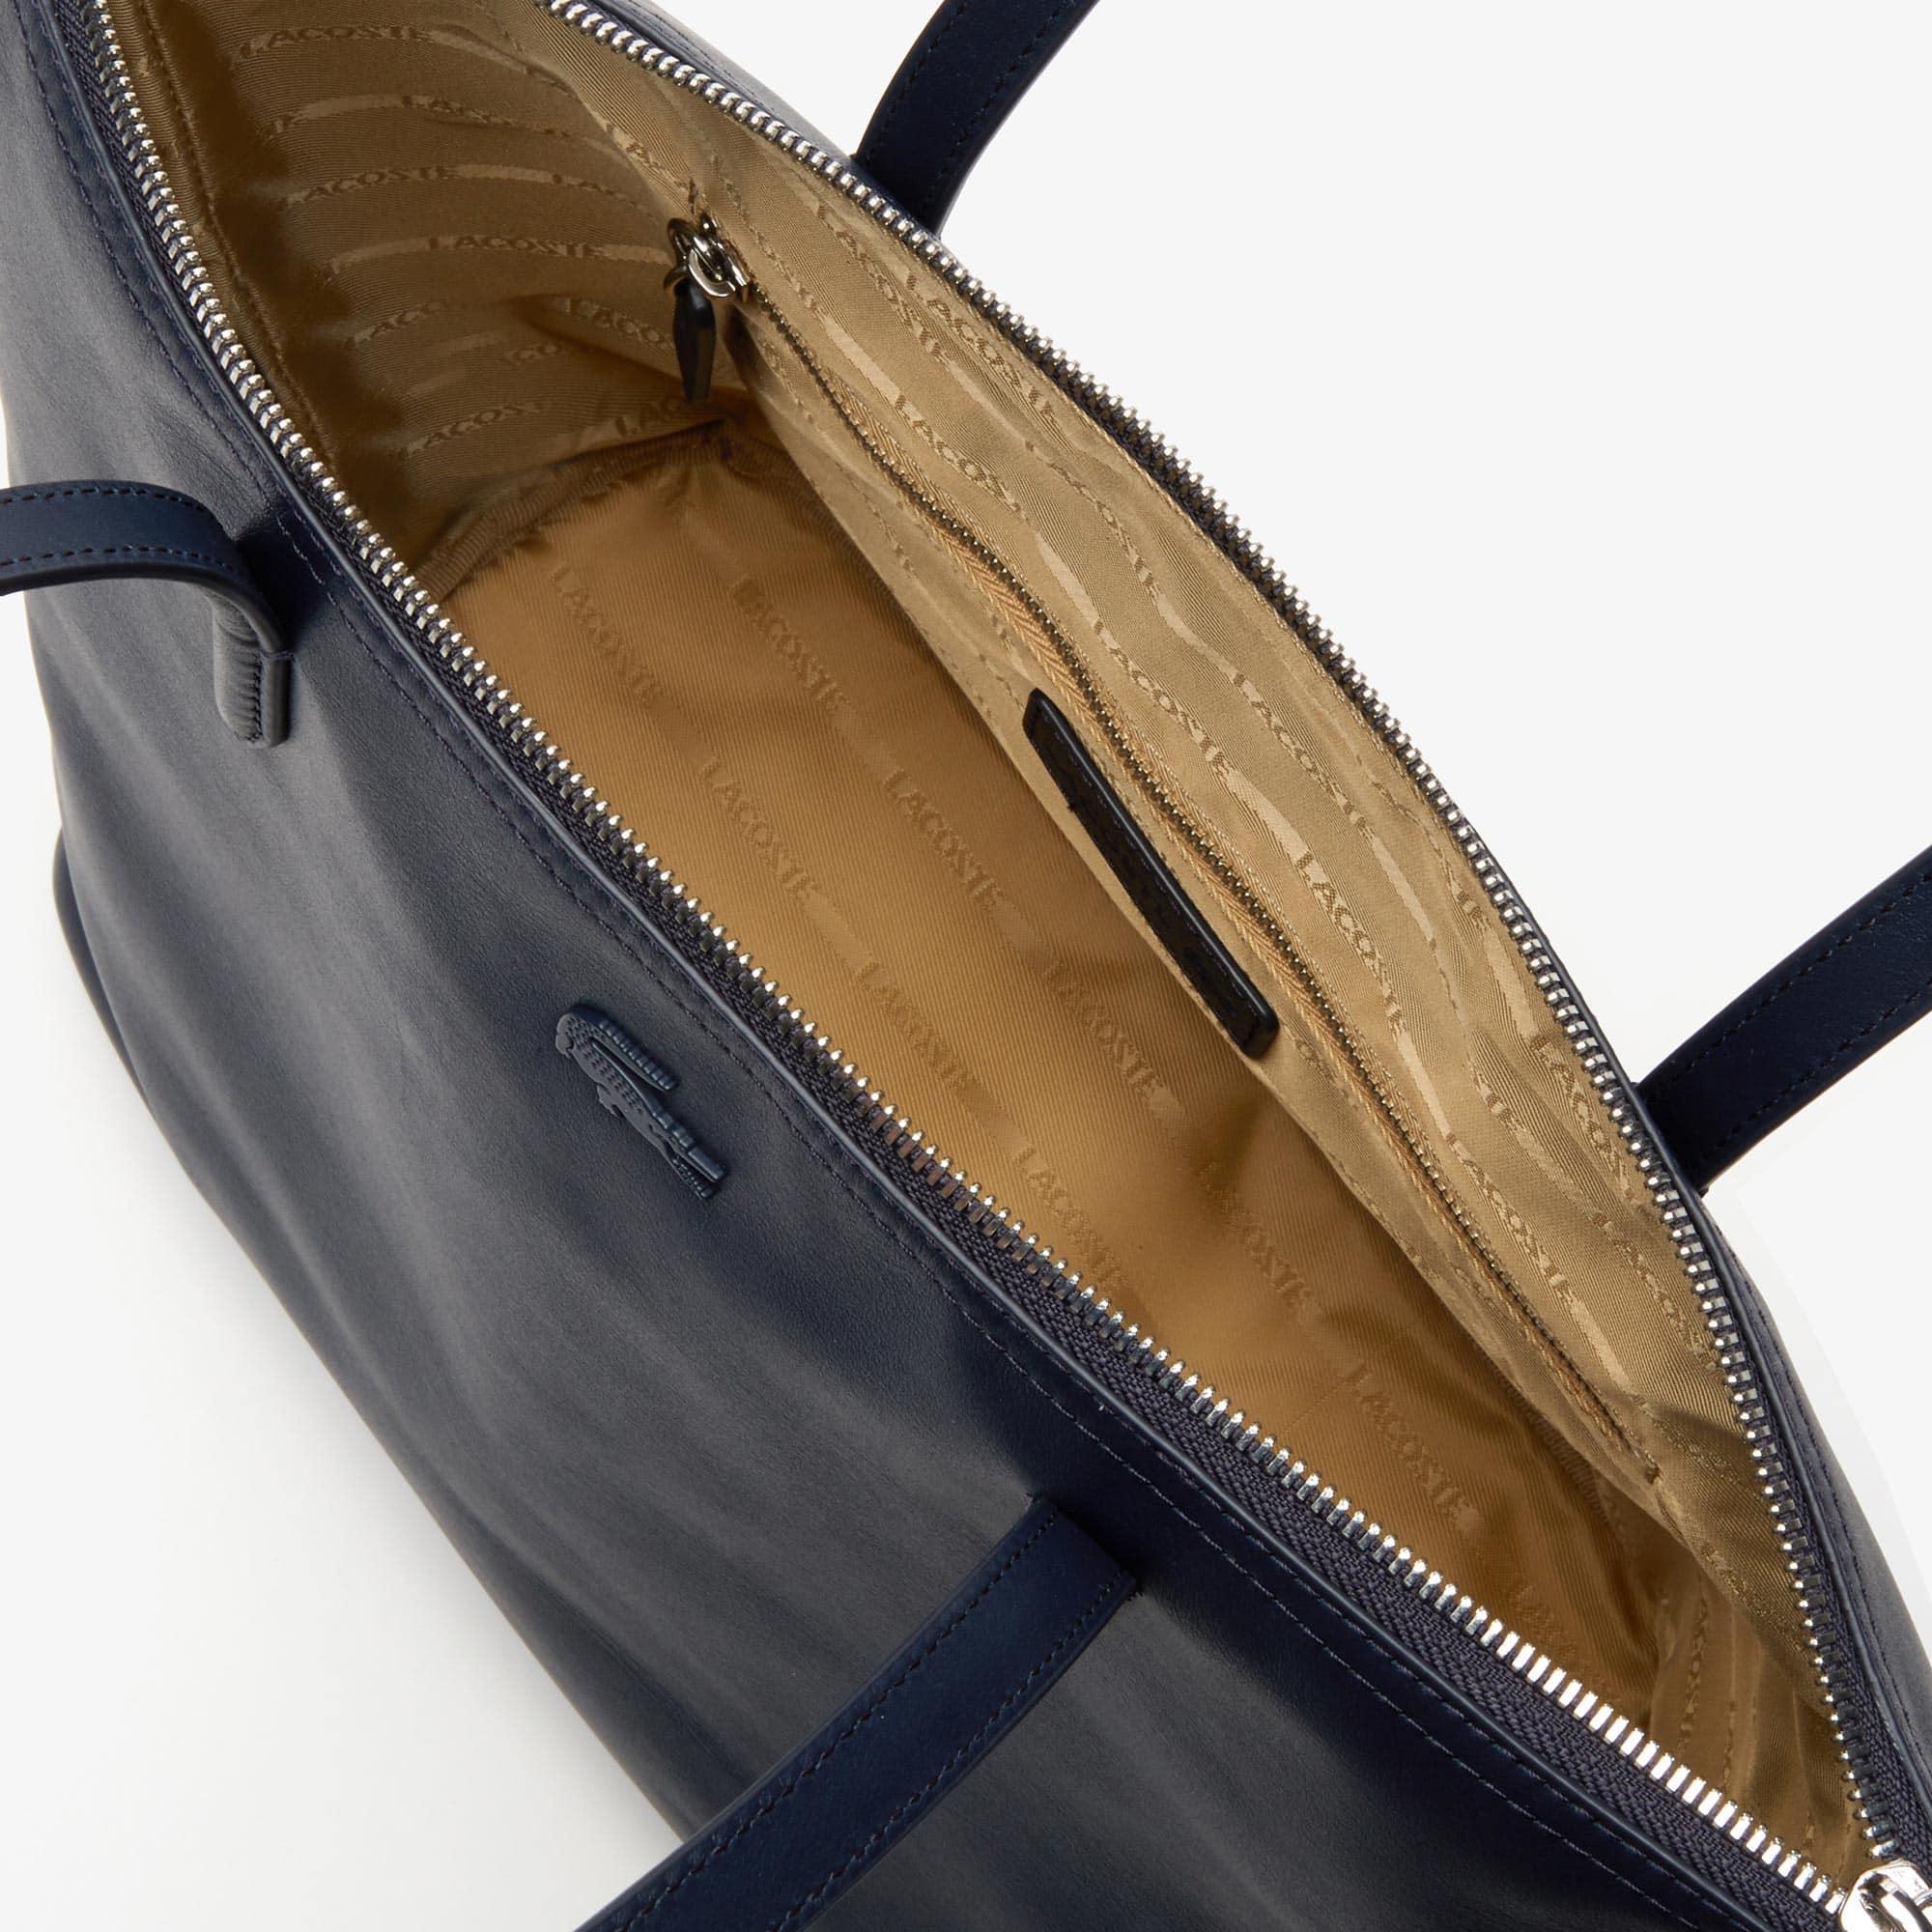 b658716db6 Women's L.12.12 Small Leather Zip Tote Bag